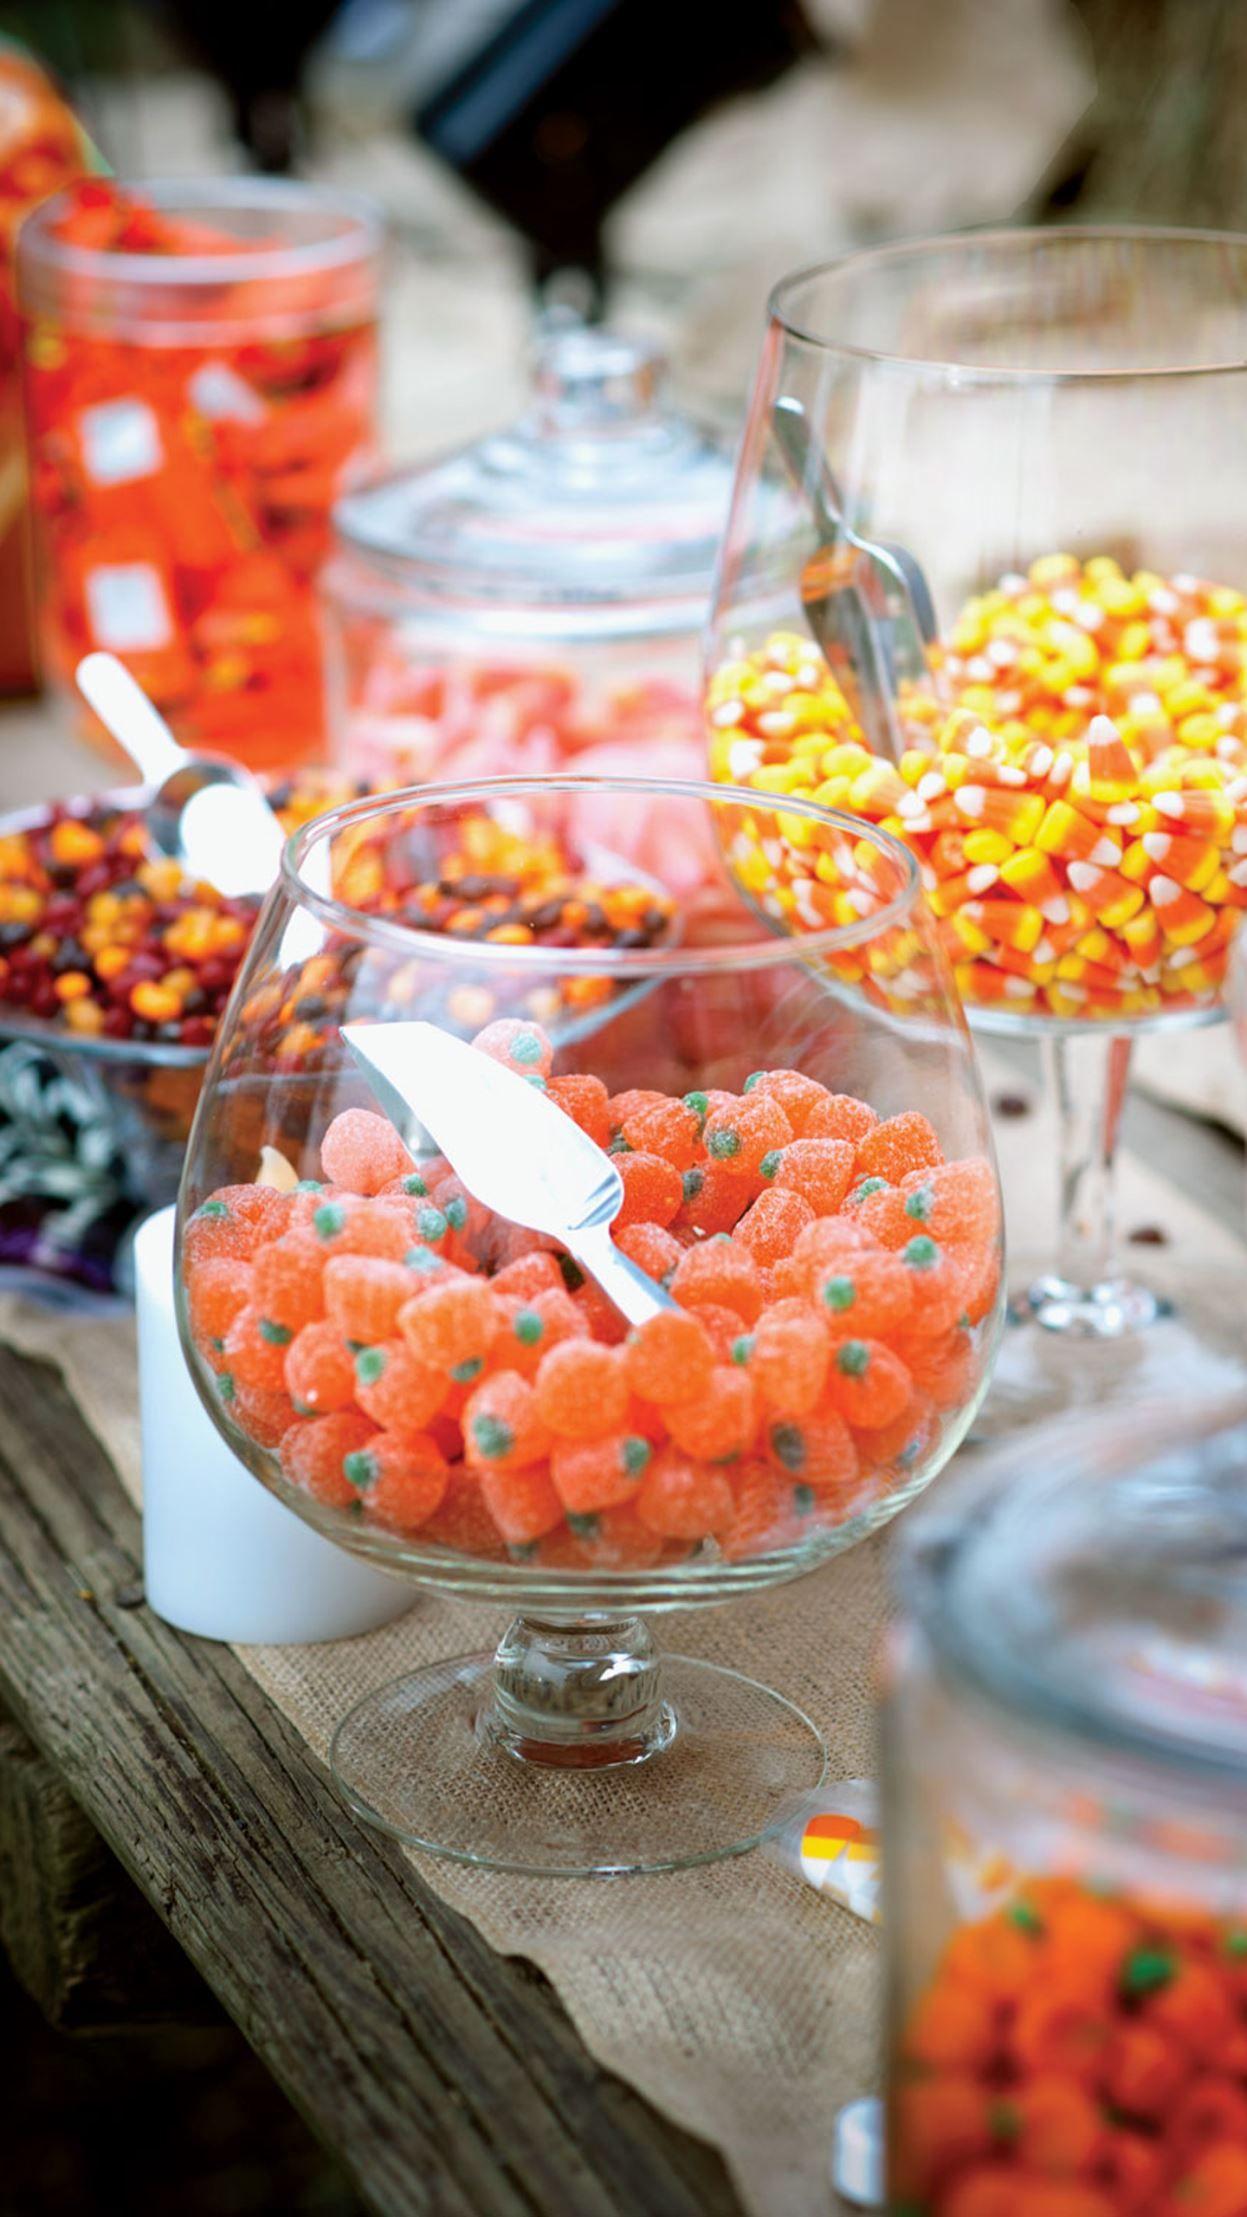 Halloween wedding ideas that are classy, not creepy